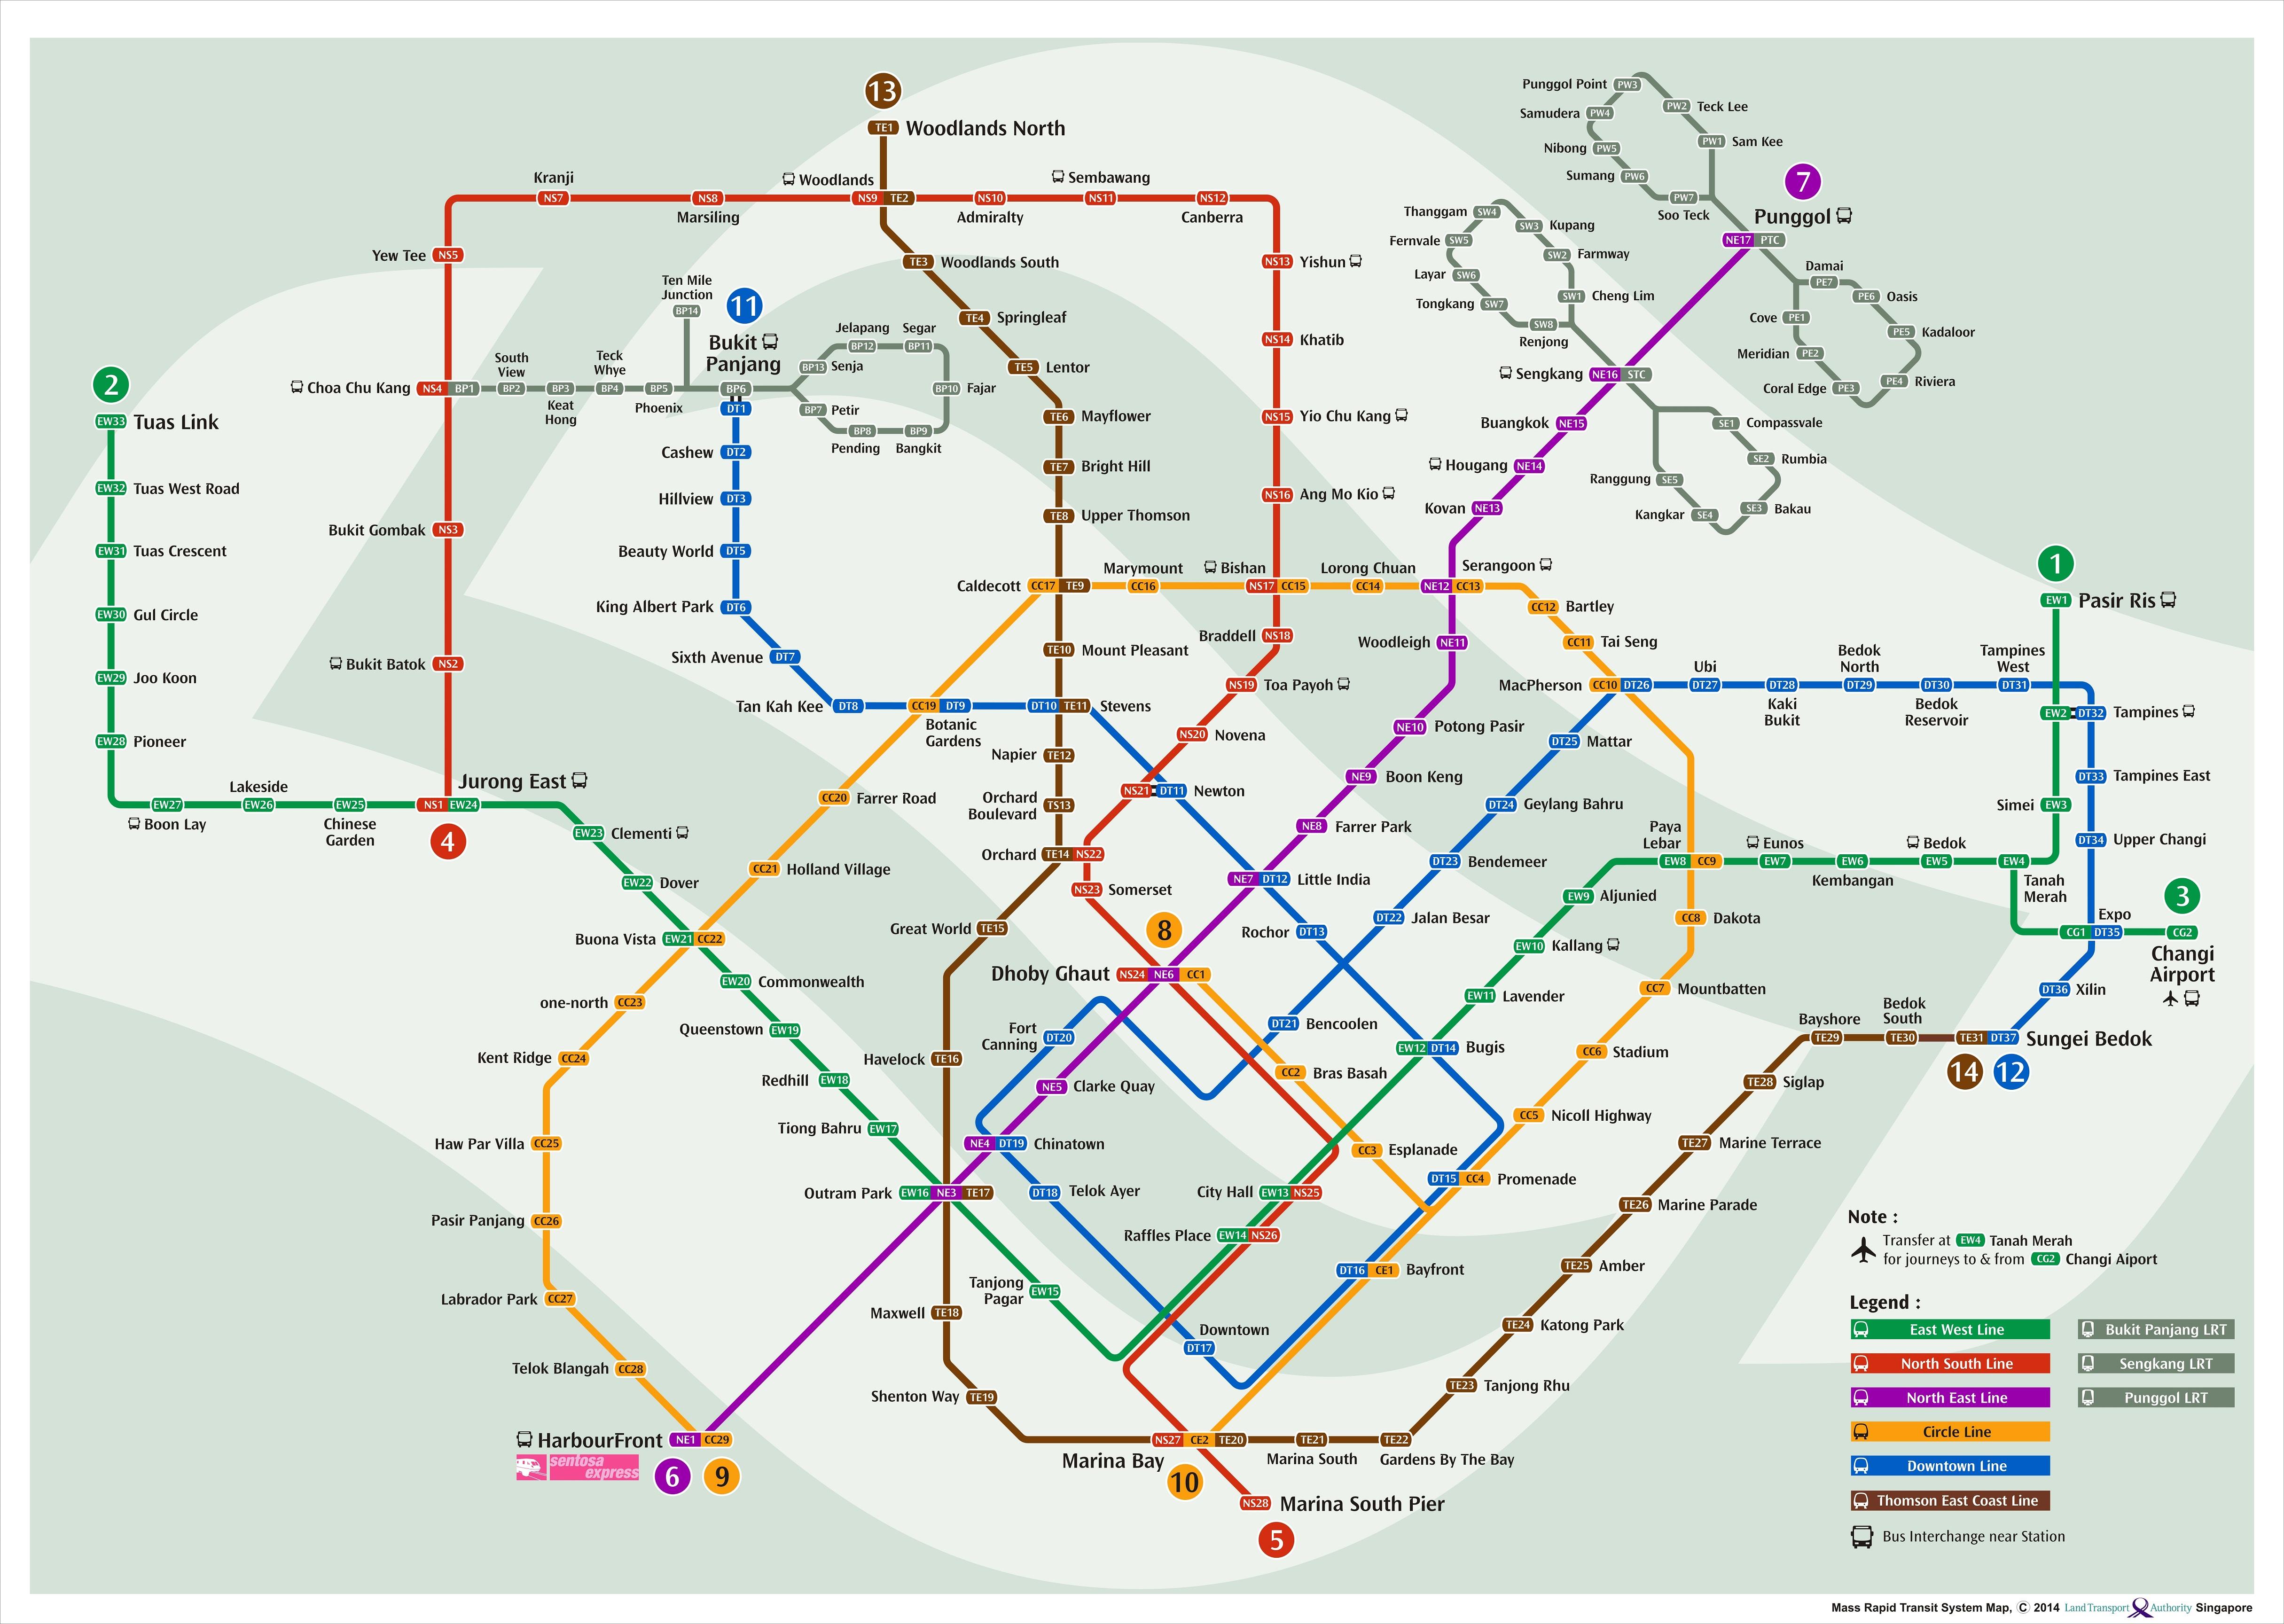 Singapore Future Mrt Lrt Map August 2014 Blog